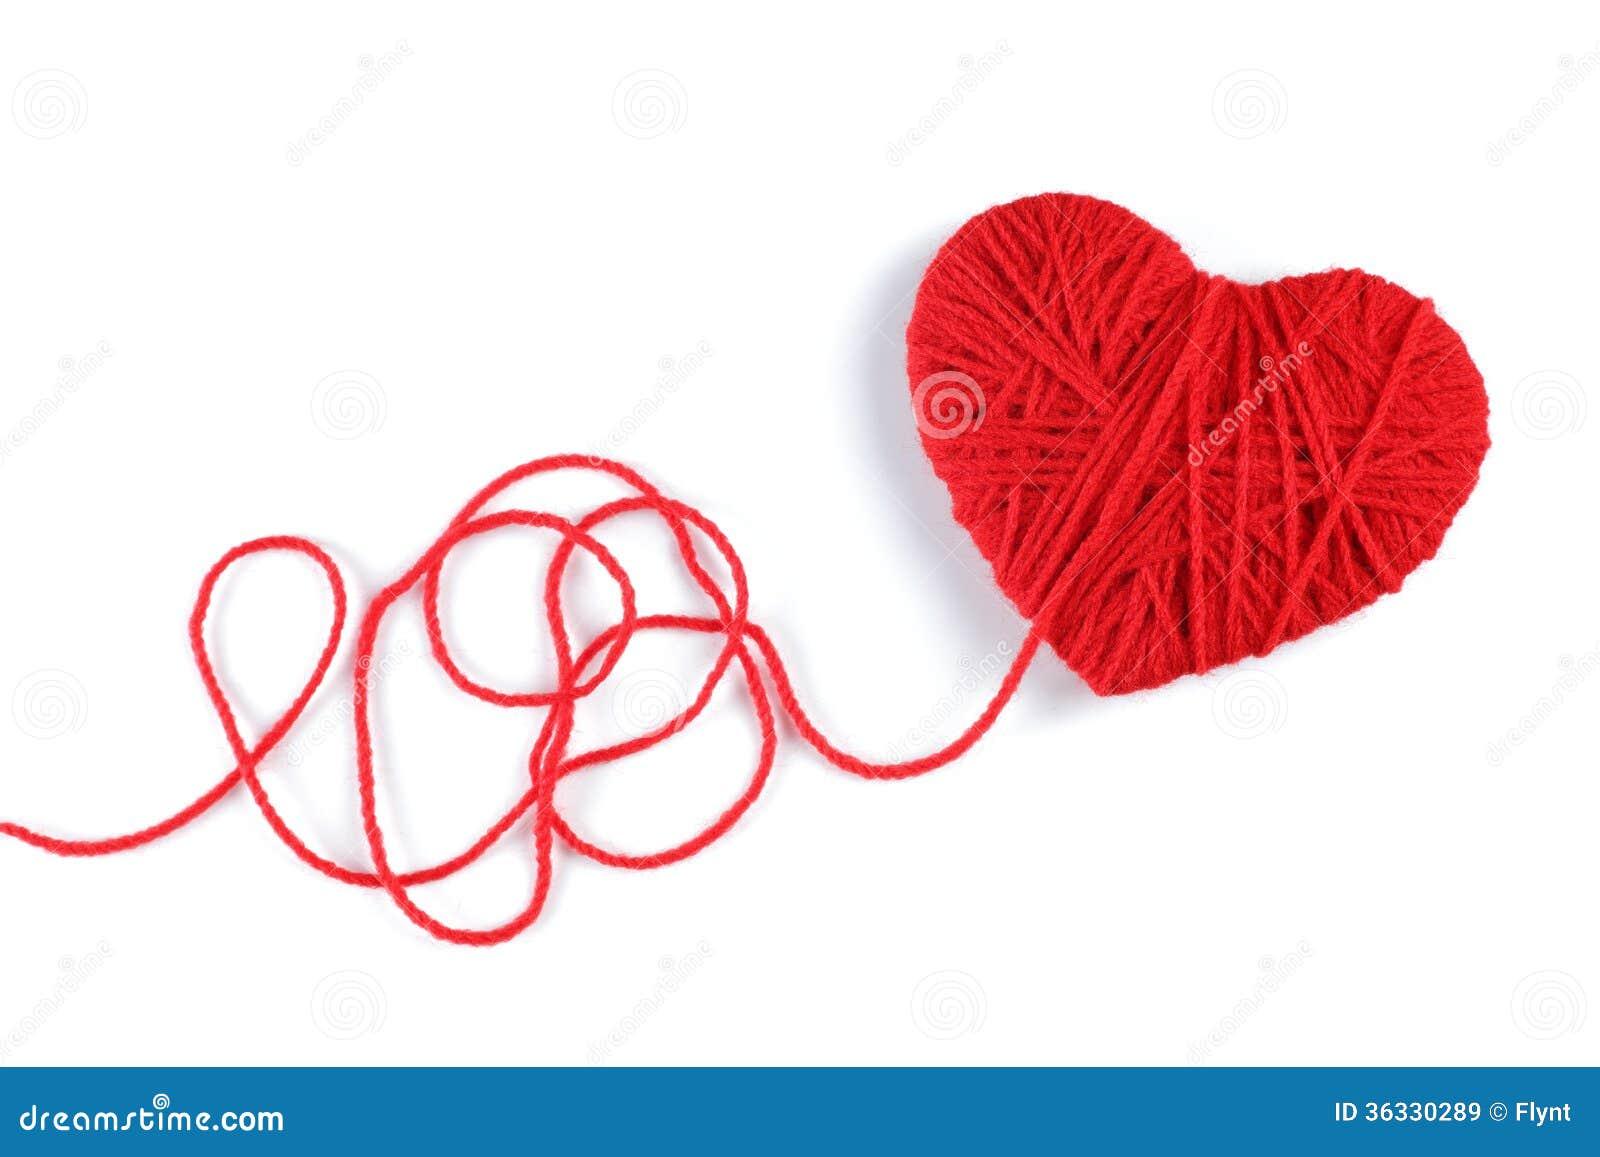 yarn of wool in heart shape symbol stock image image of copy item rh dreamstime com